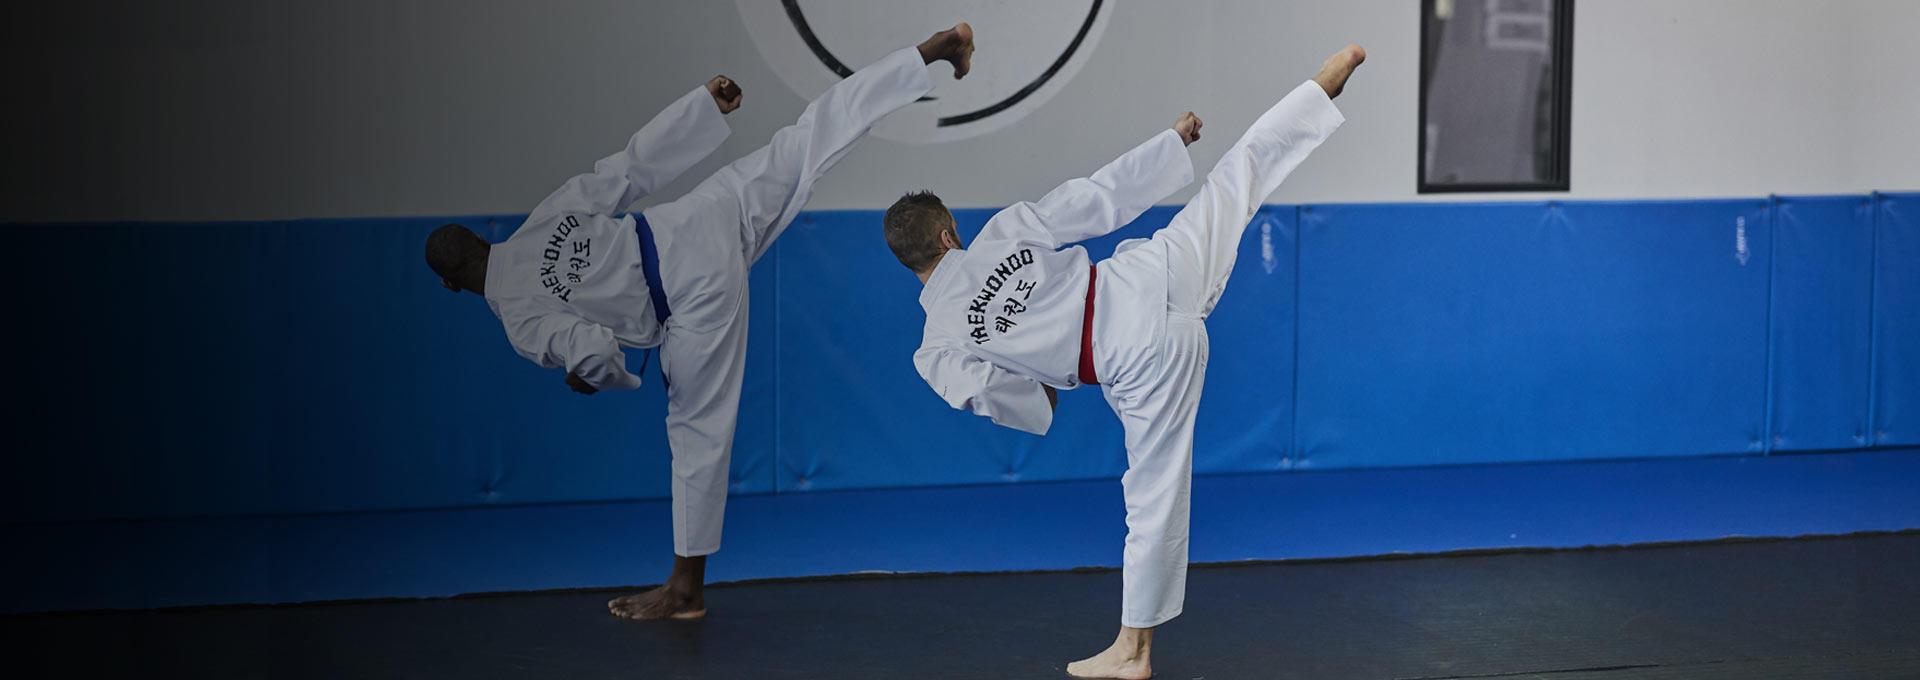 Rentrée sportive Taekwondo